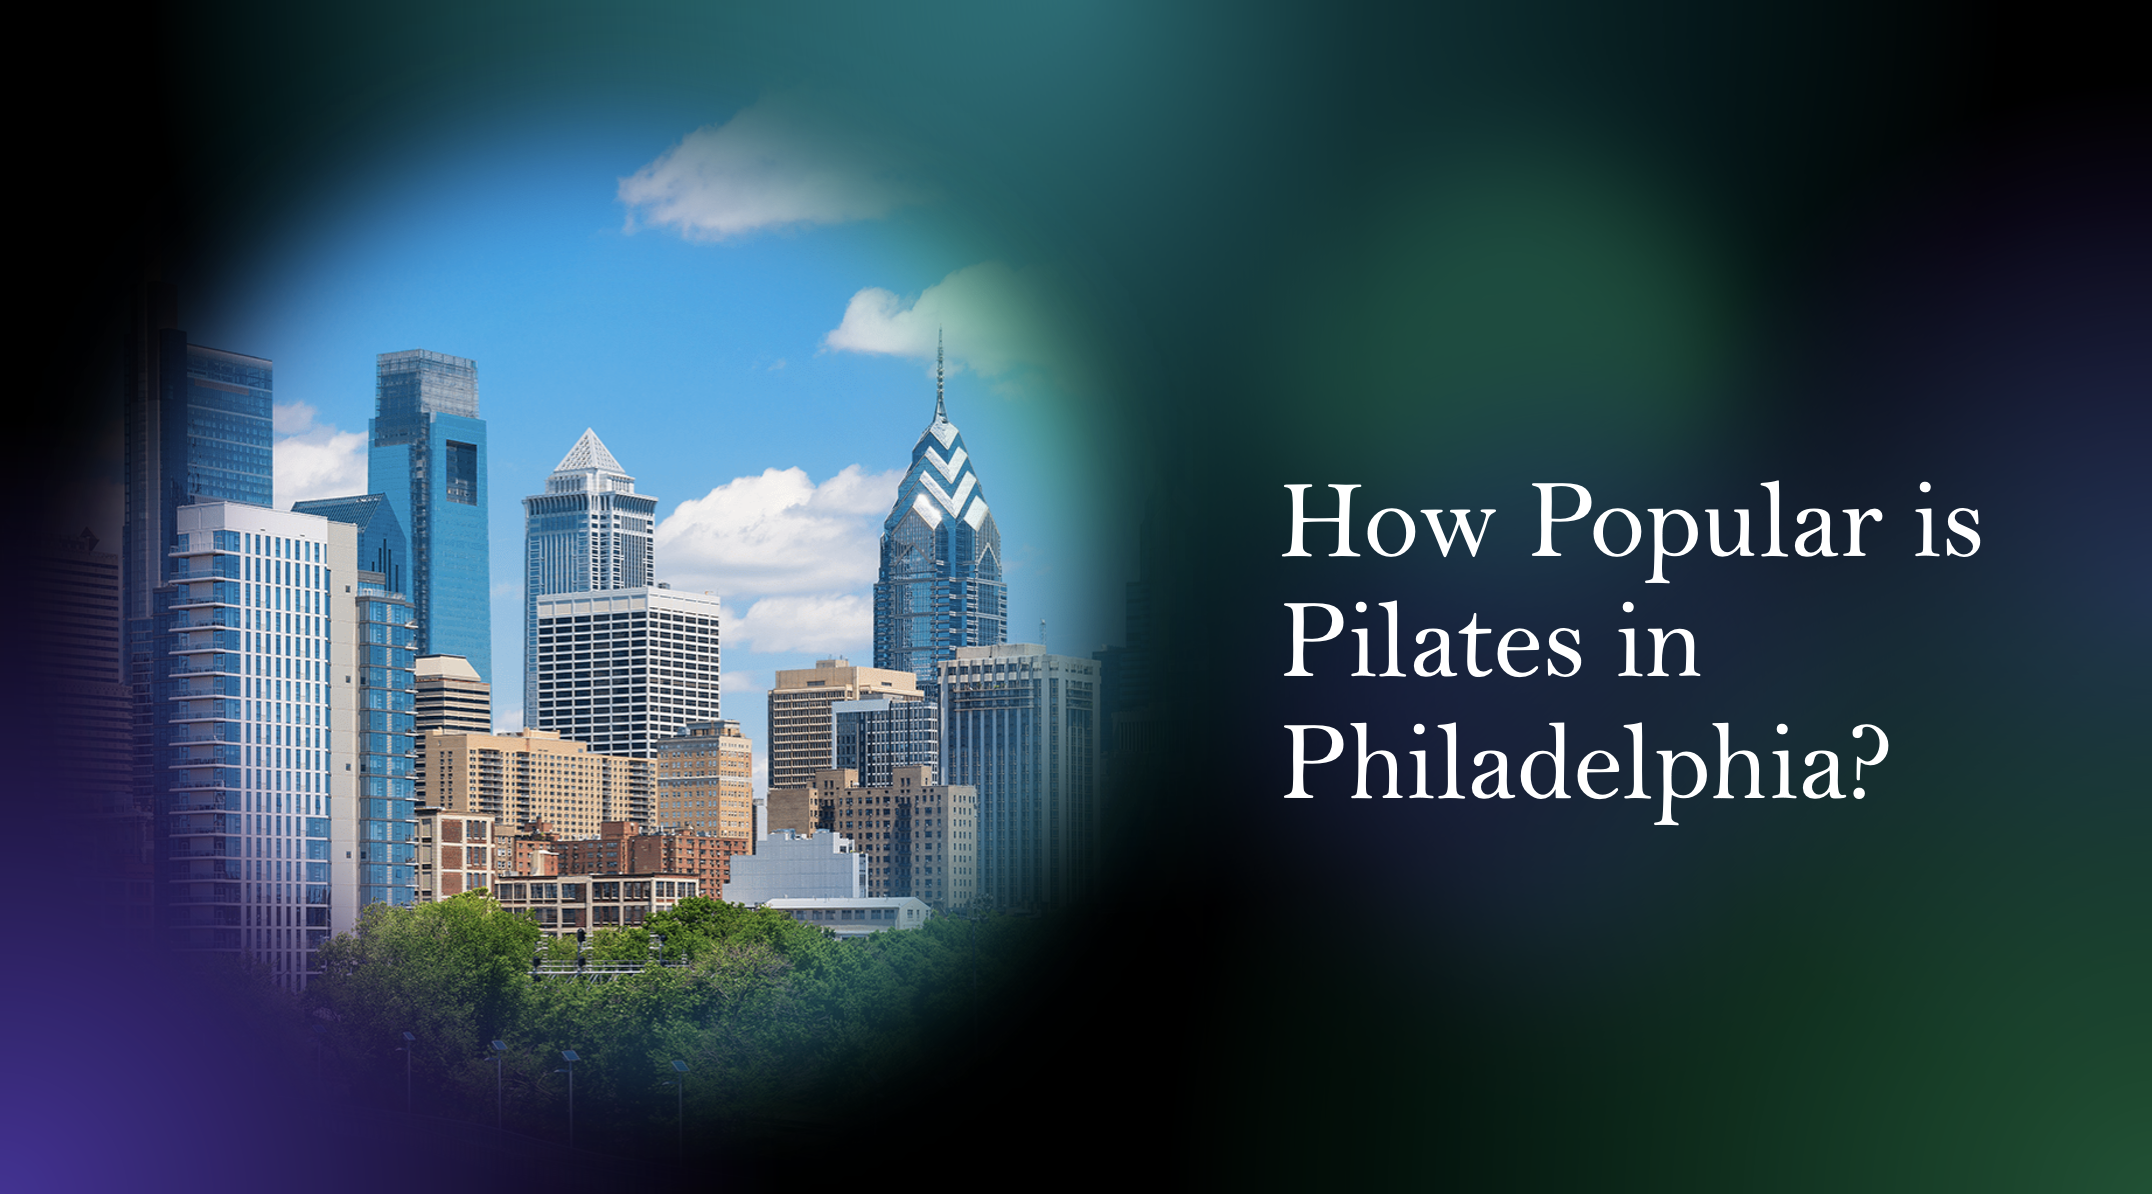 How Popular is Pilates in Philadelphia?